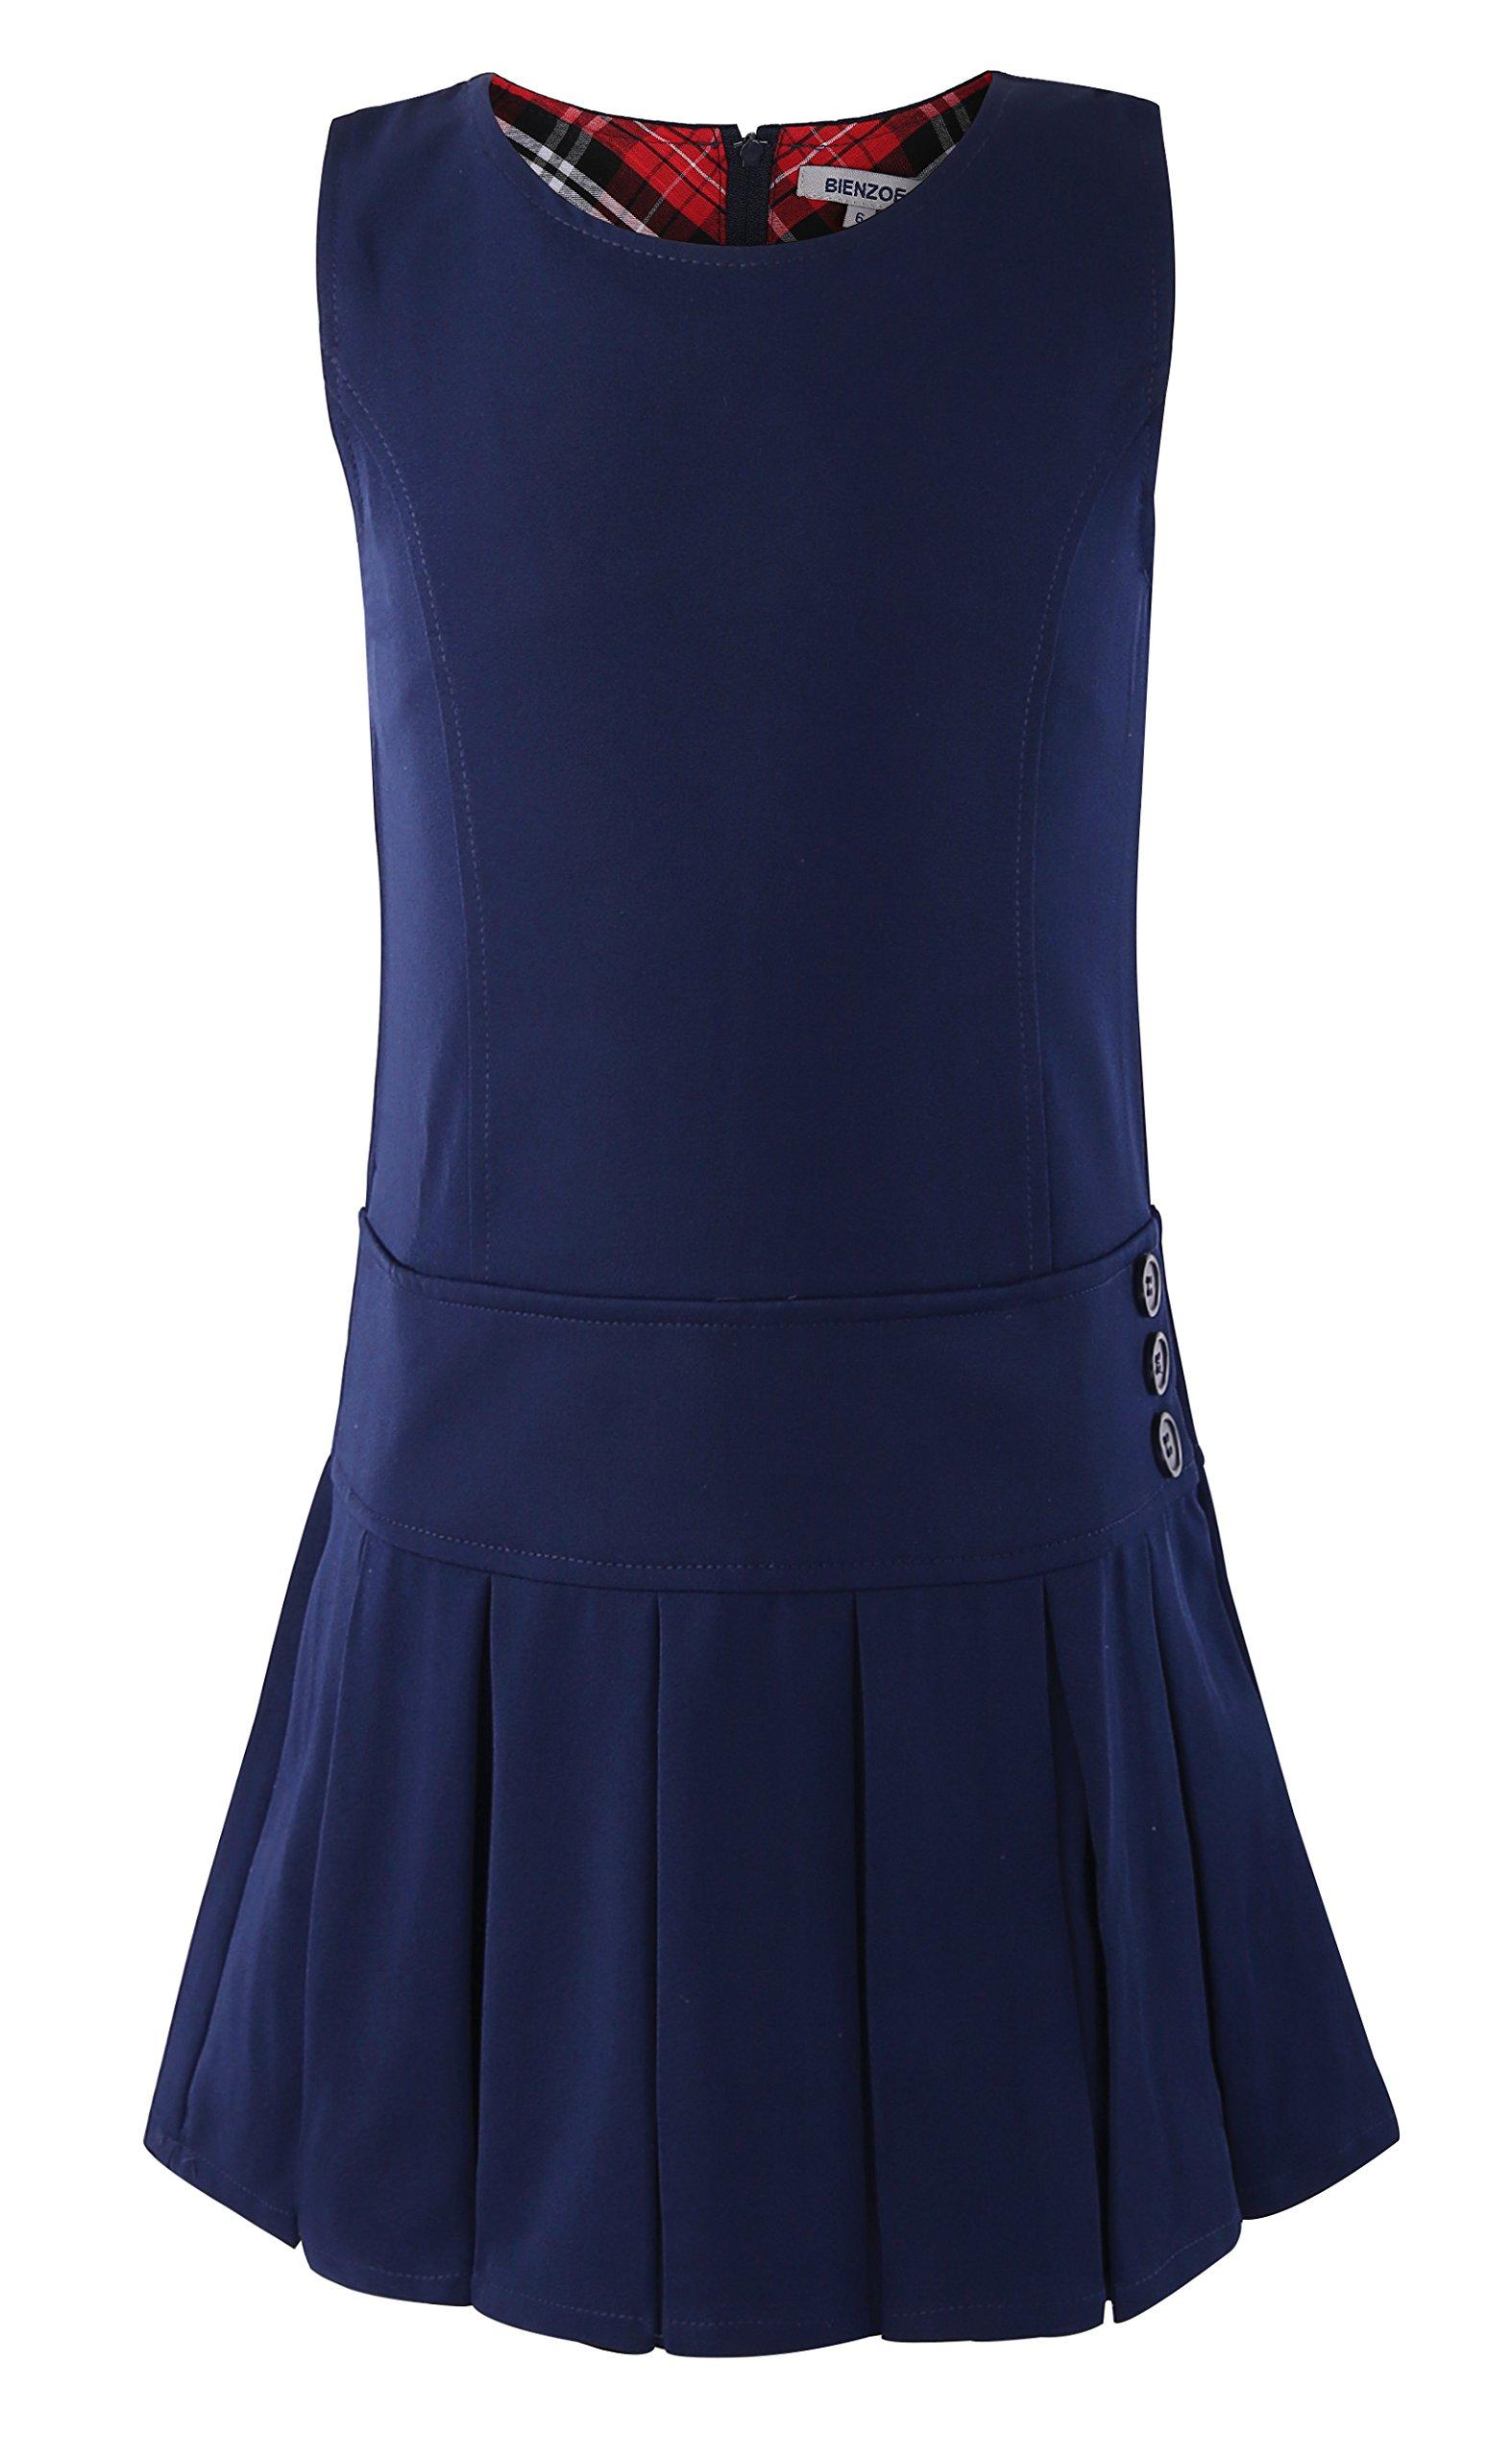 Bienzoe Girl's Stretchy Pleated Durable School Uniforms Jumper Navy 10